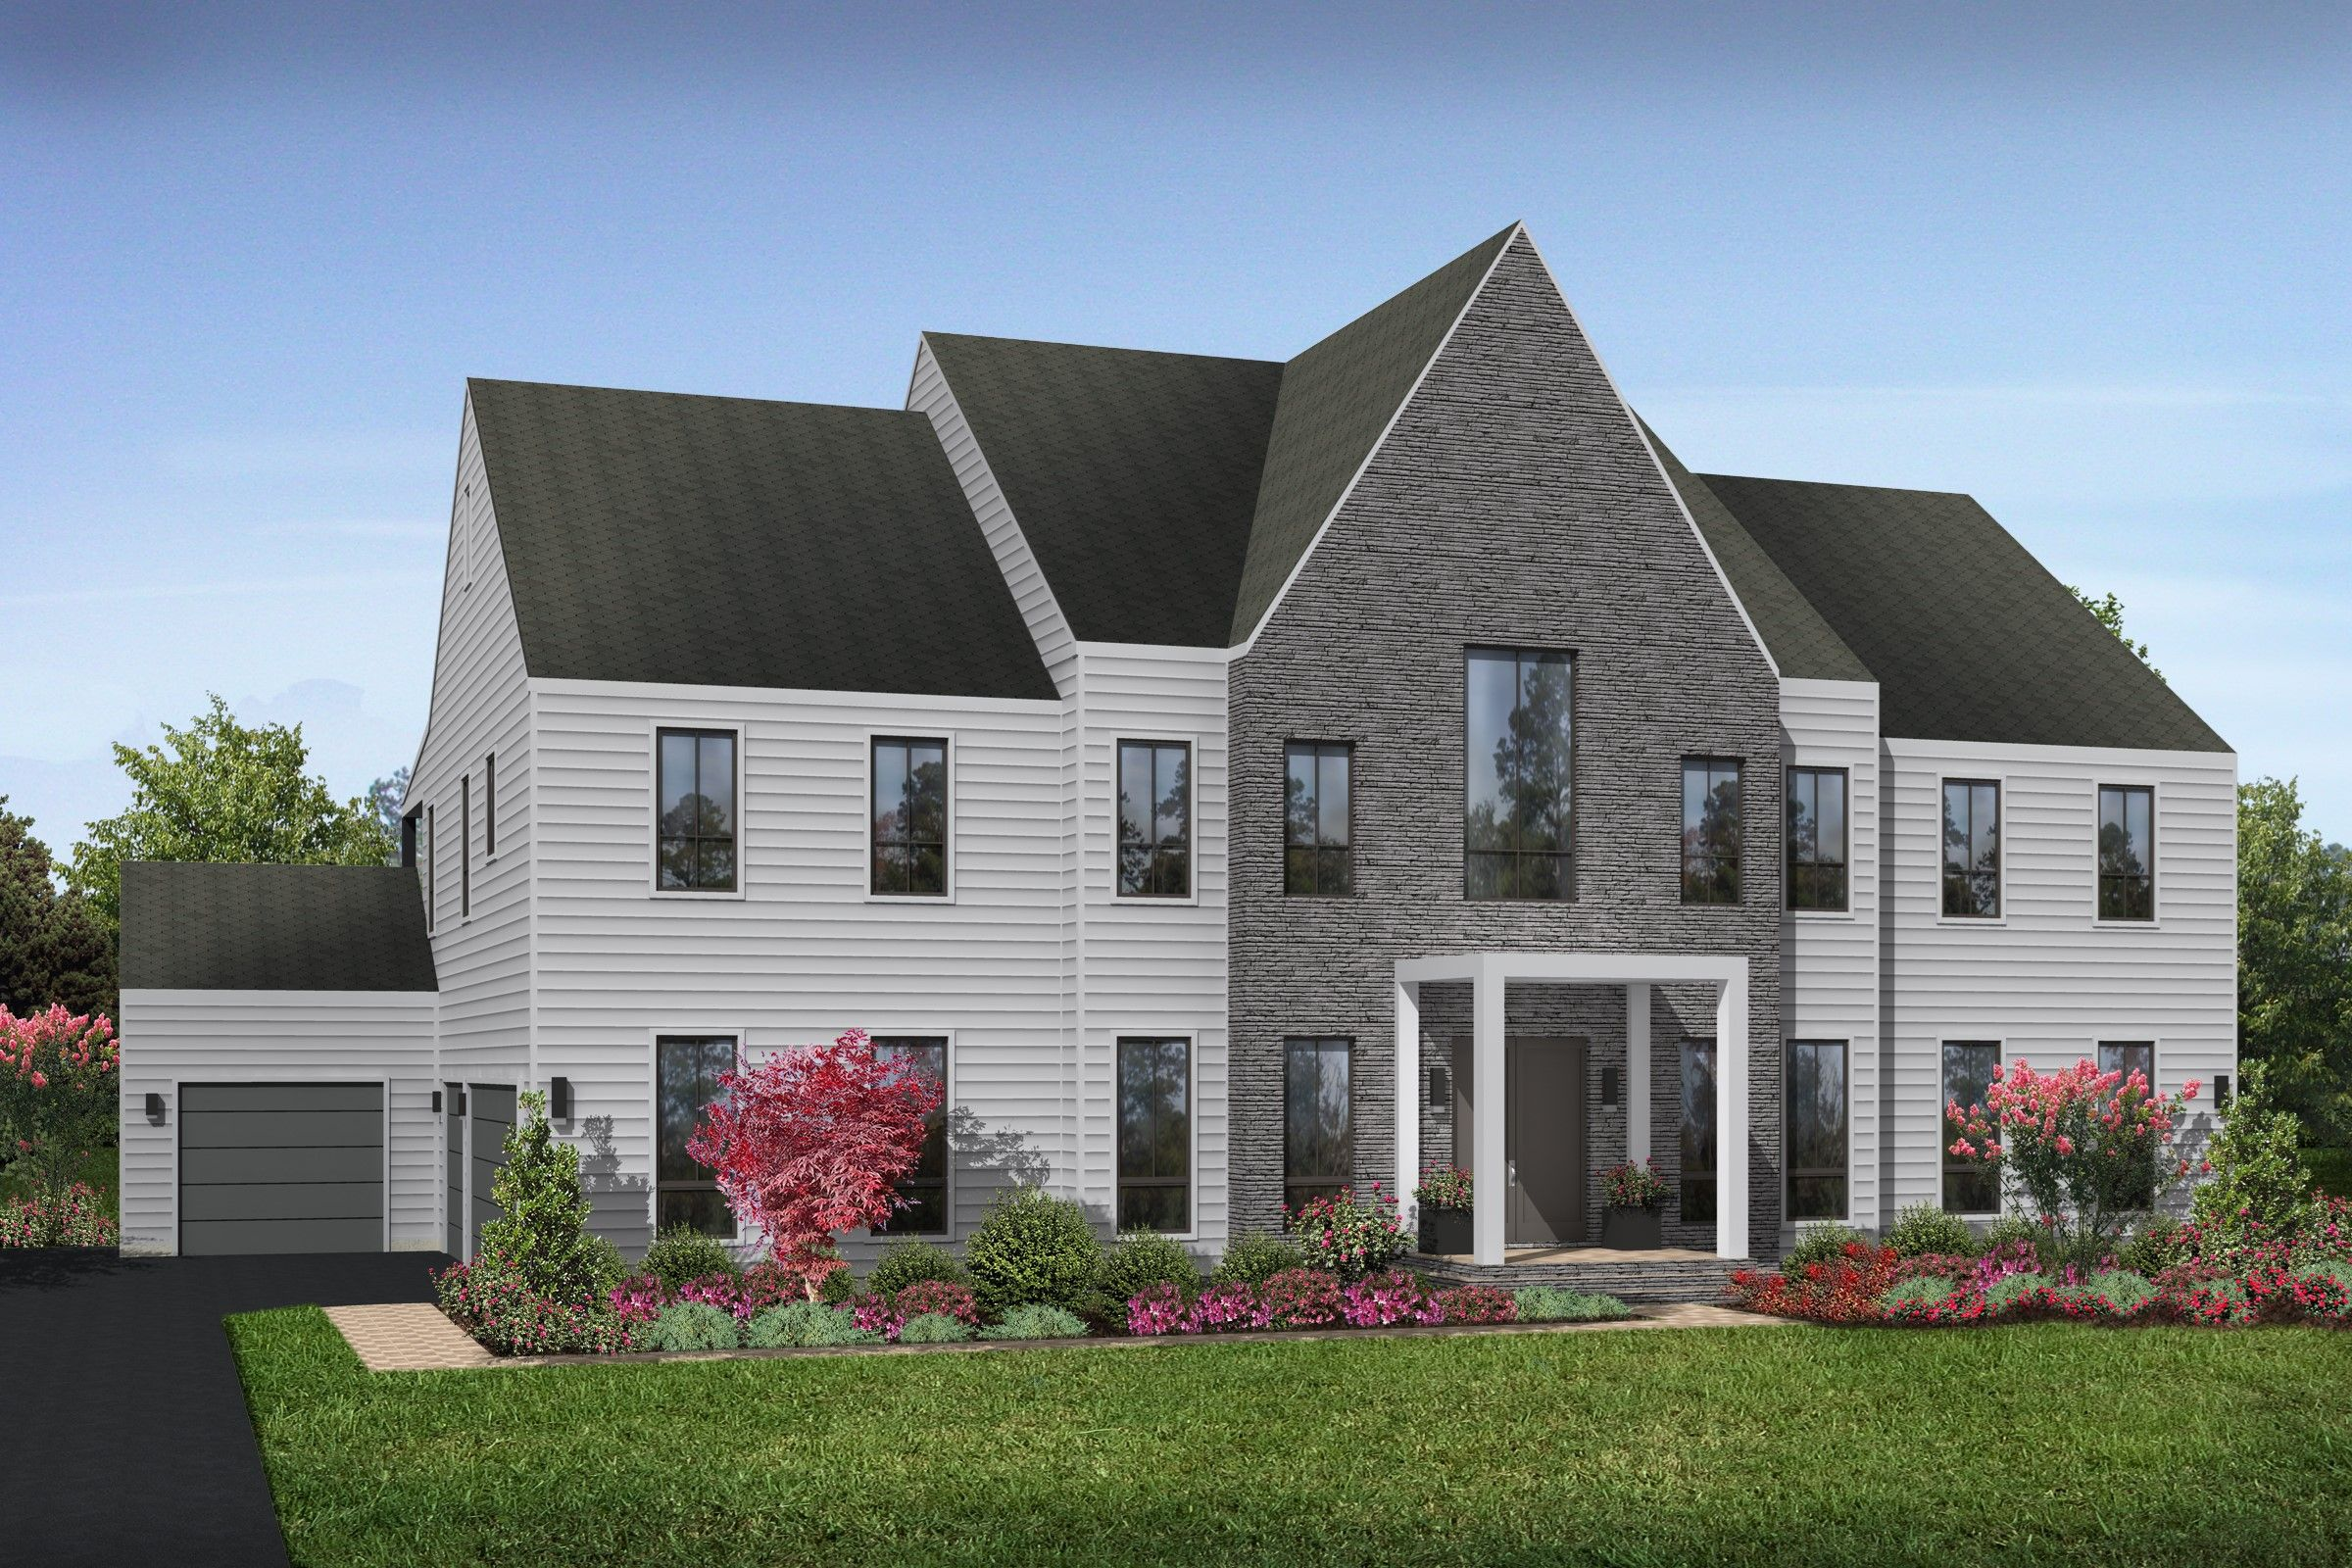 New Homes in Ashburn, VA   1,336 New Homes   NewHomeSource